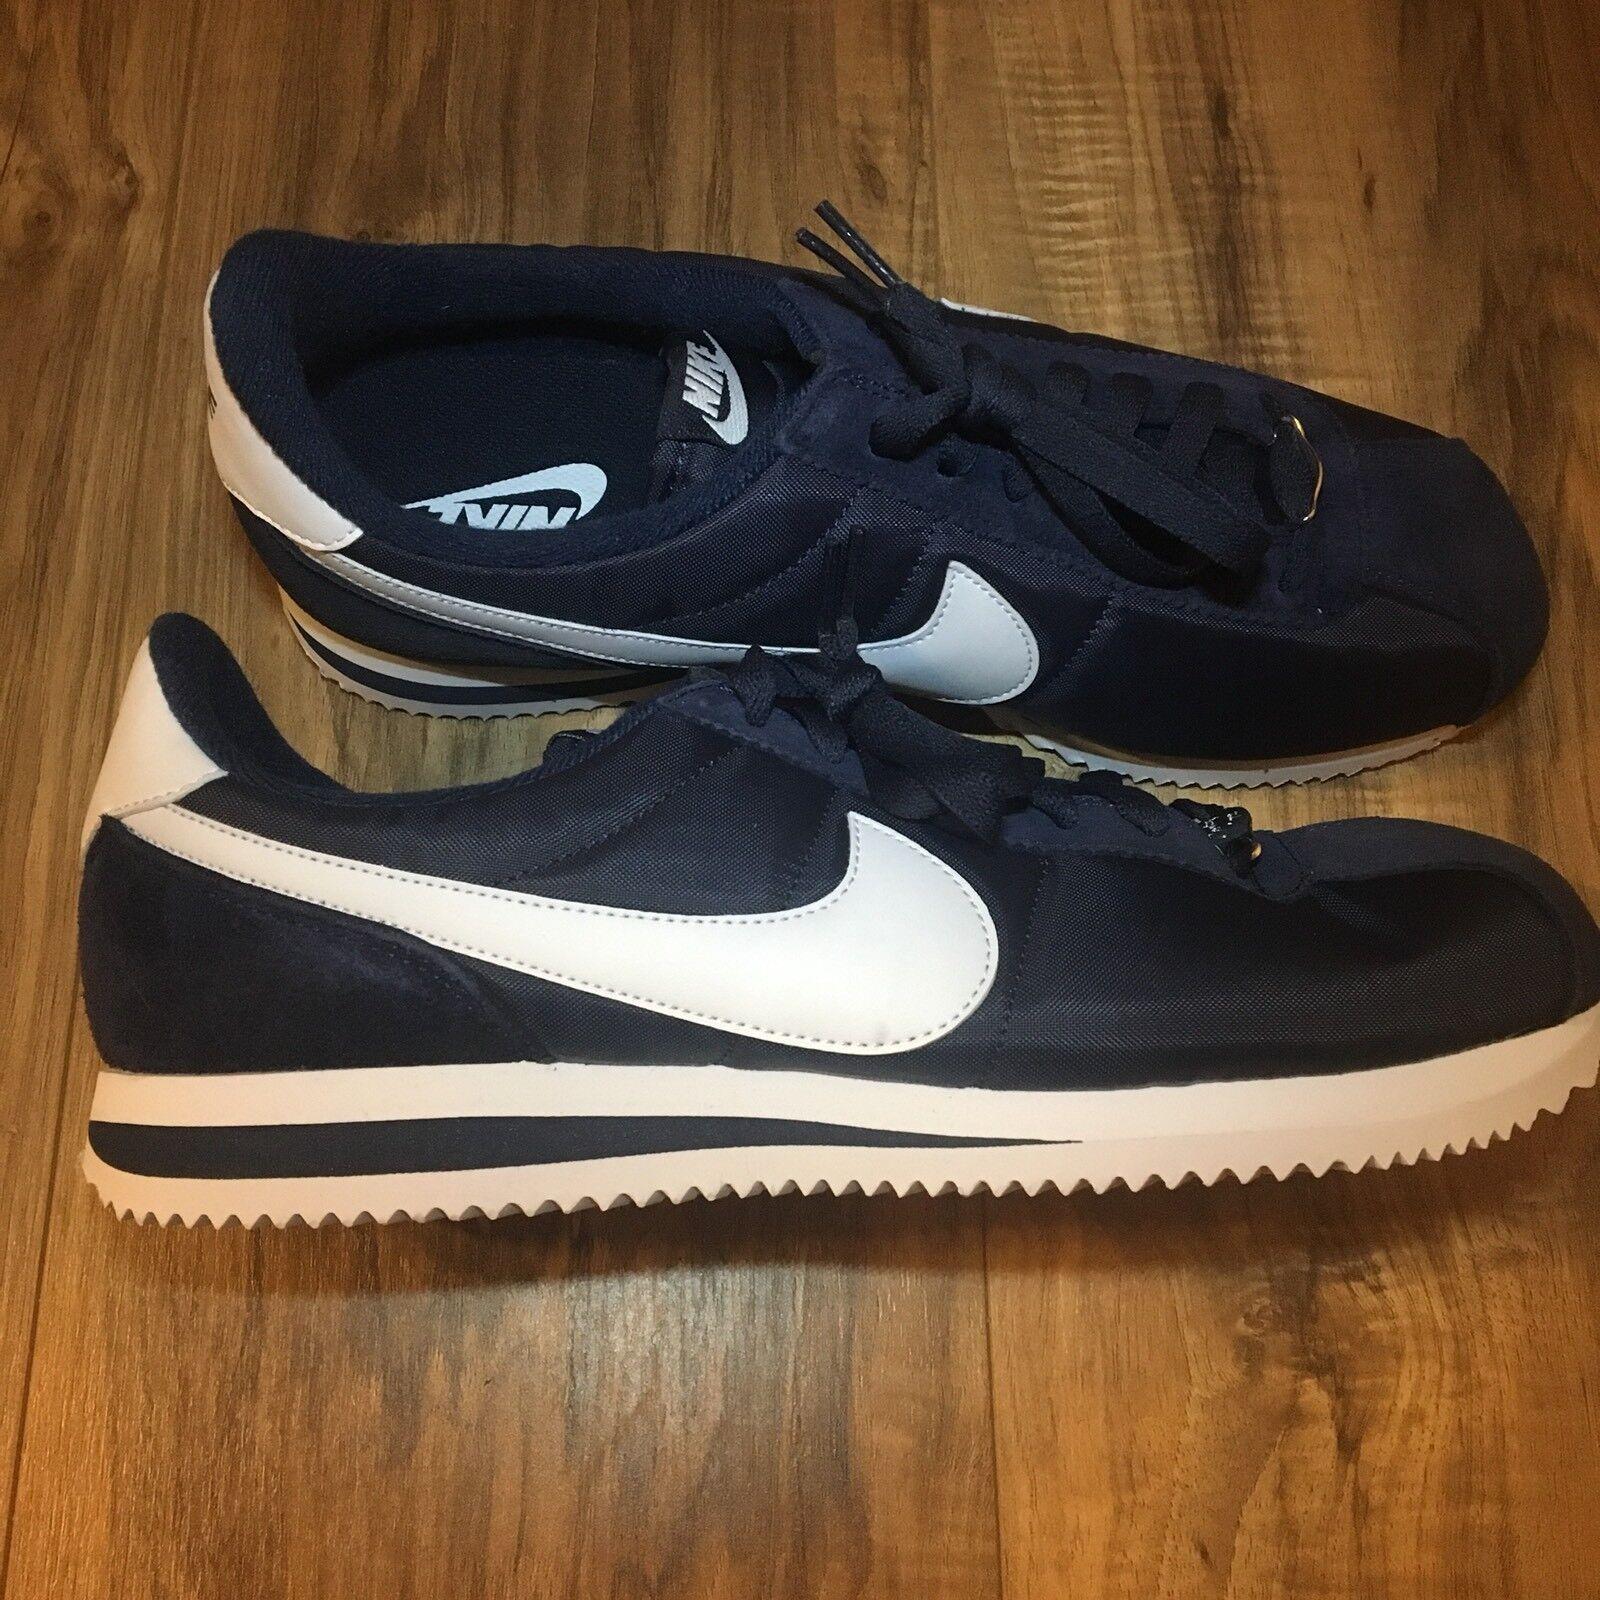 Nike Cortez Basic Nylon Obsidian/White  Casual Shoes 819720 411 Men's size 10.5